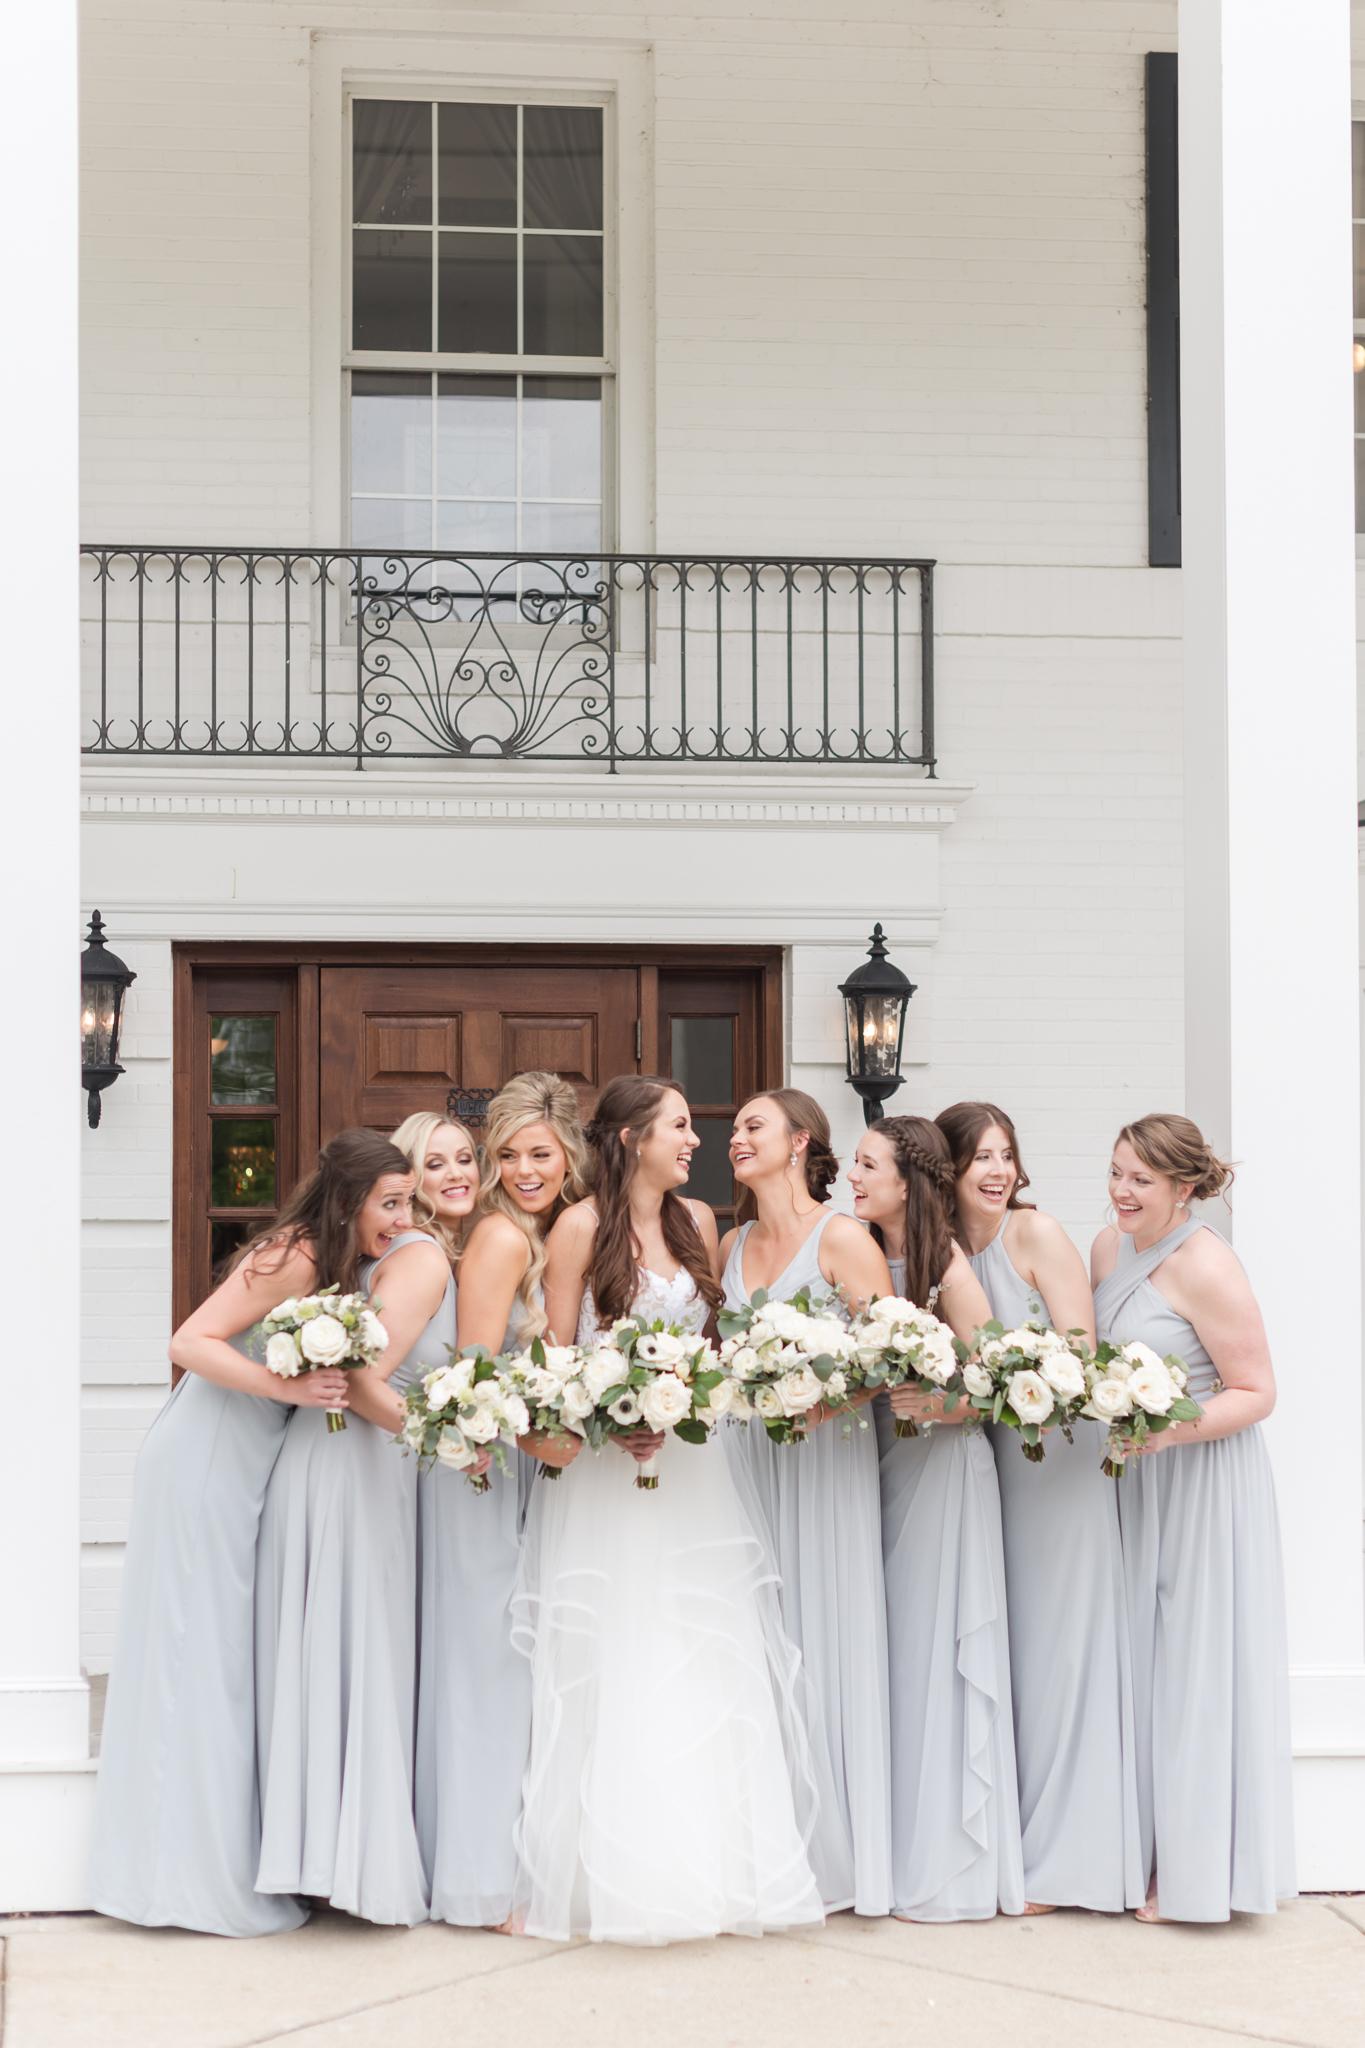 Black Iris Estate Wedding Elegant White with Greenery Luxury High End Flowers-12.jpg